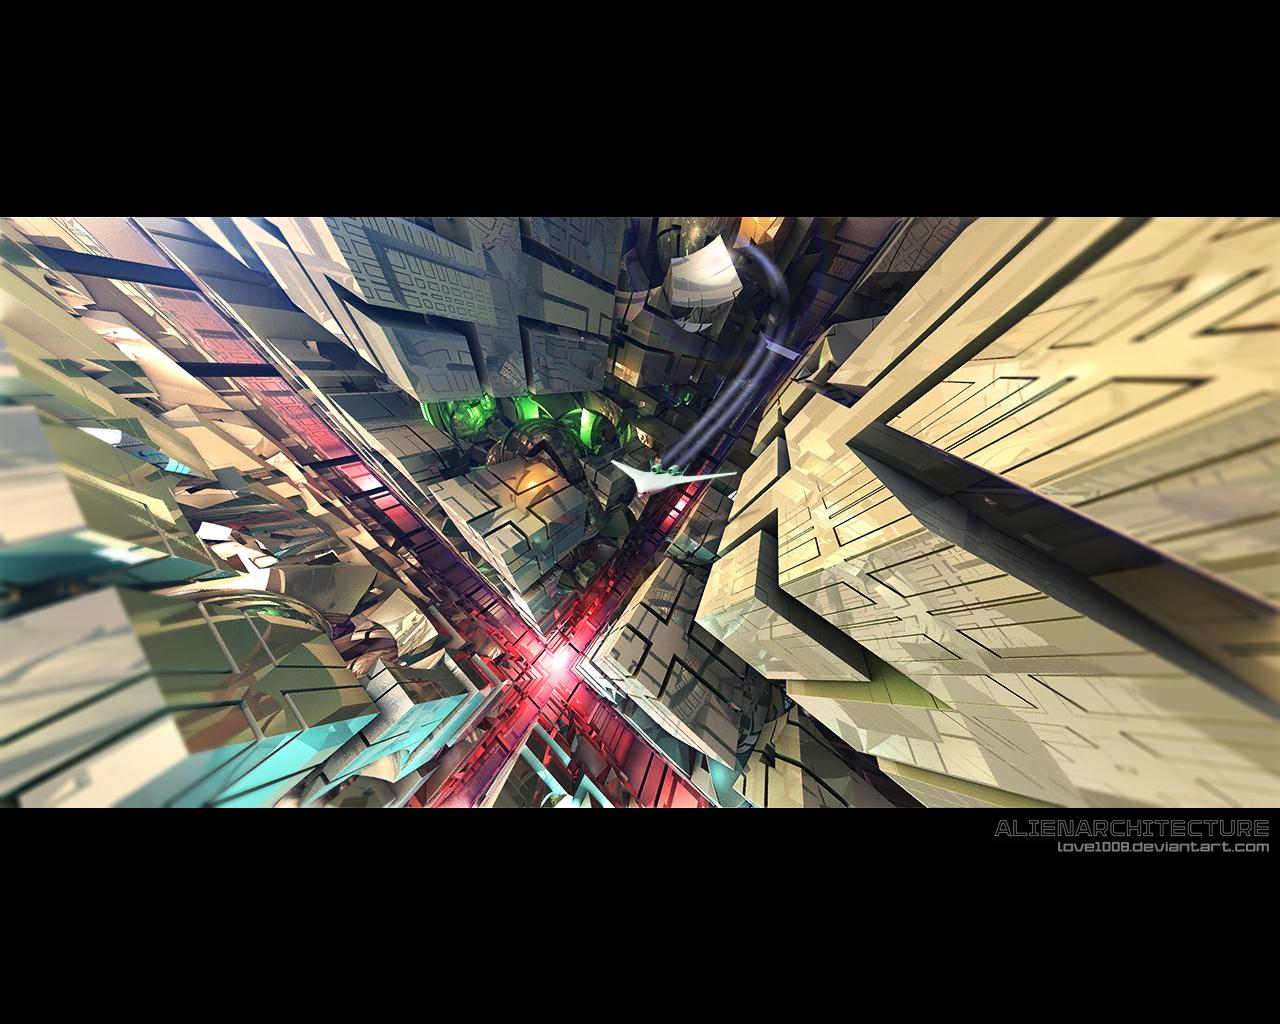 Alienarchitecture 15 by love1008